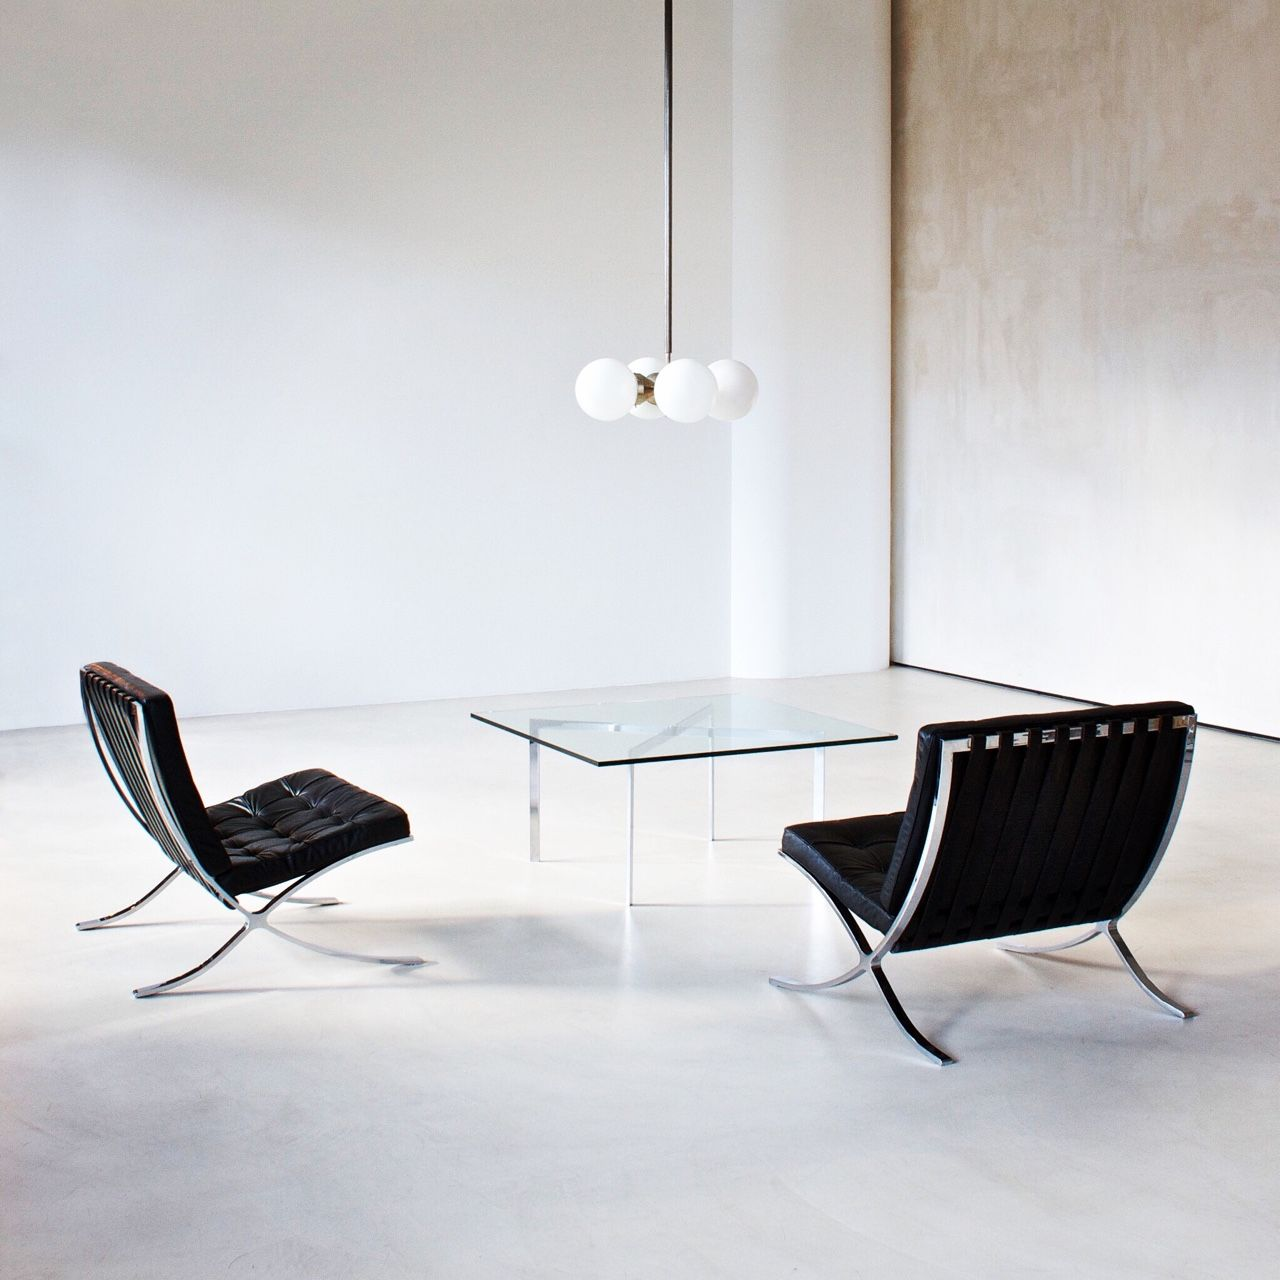 Eames Lounge Chair & Ottoman Premium Reproduction Eames